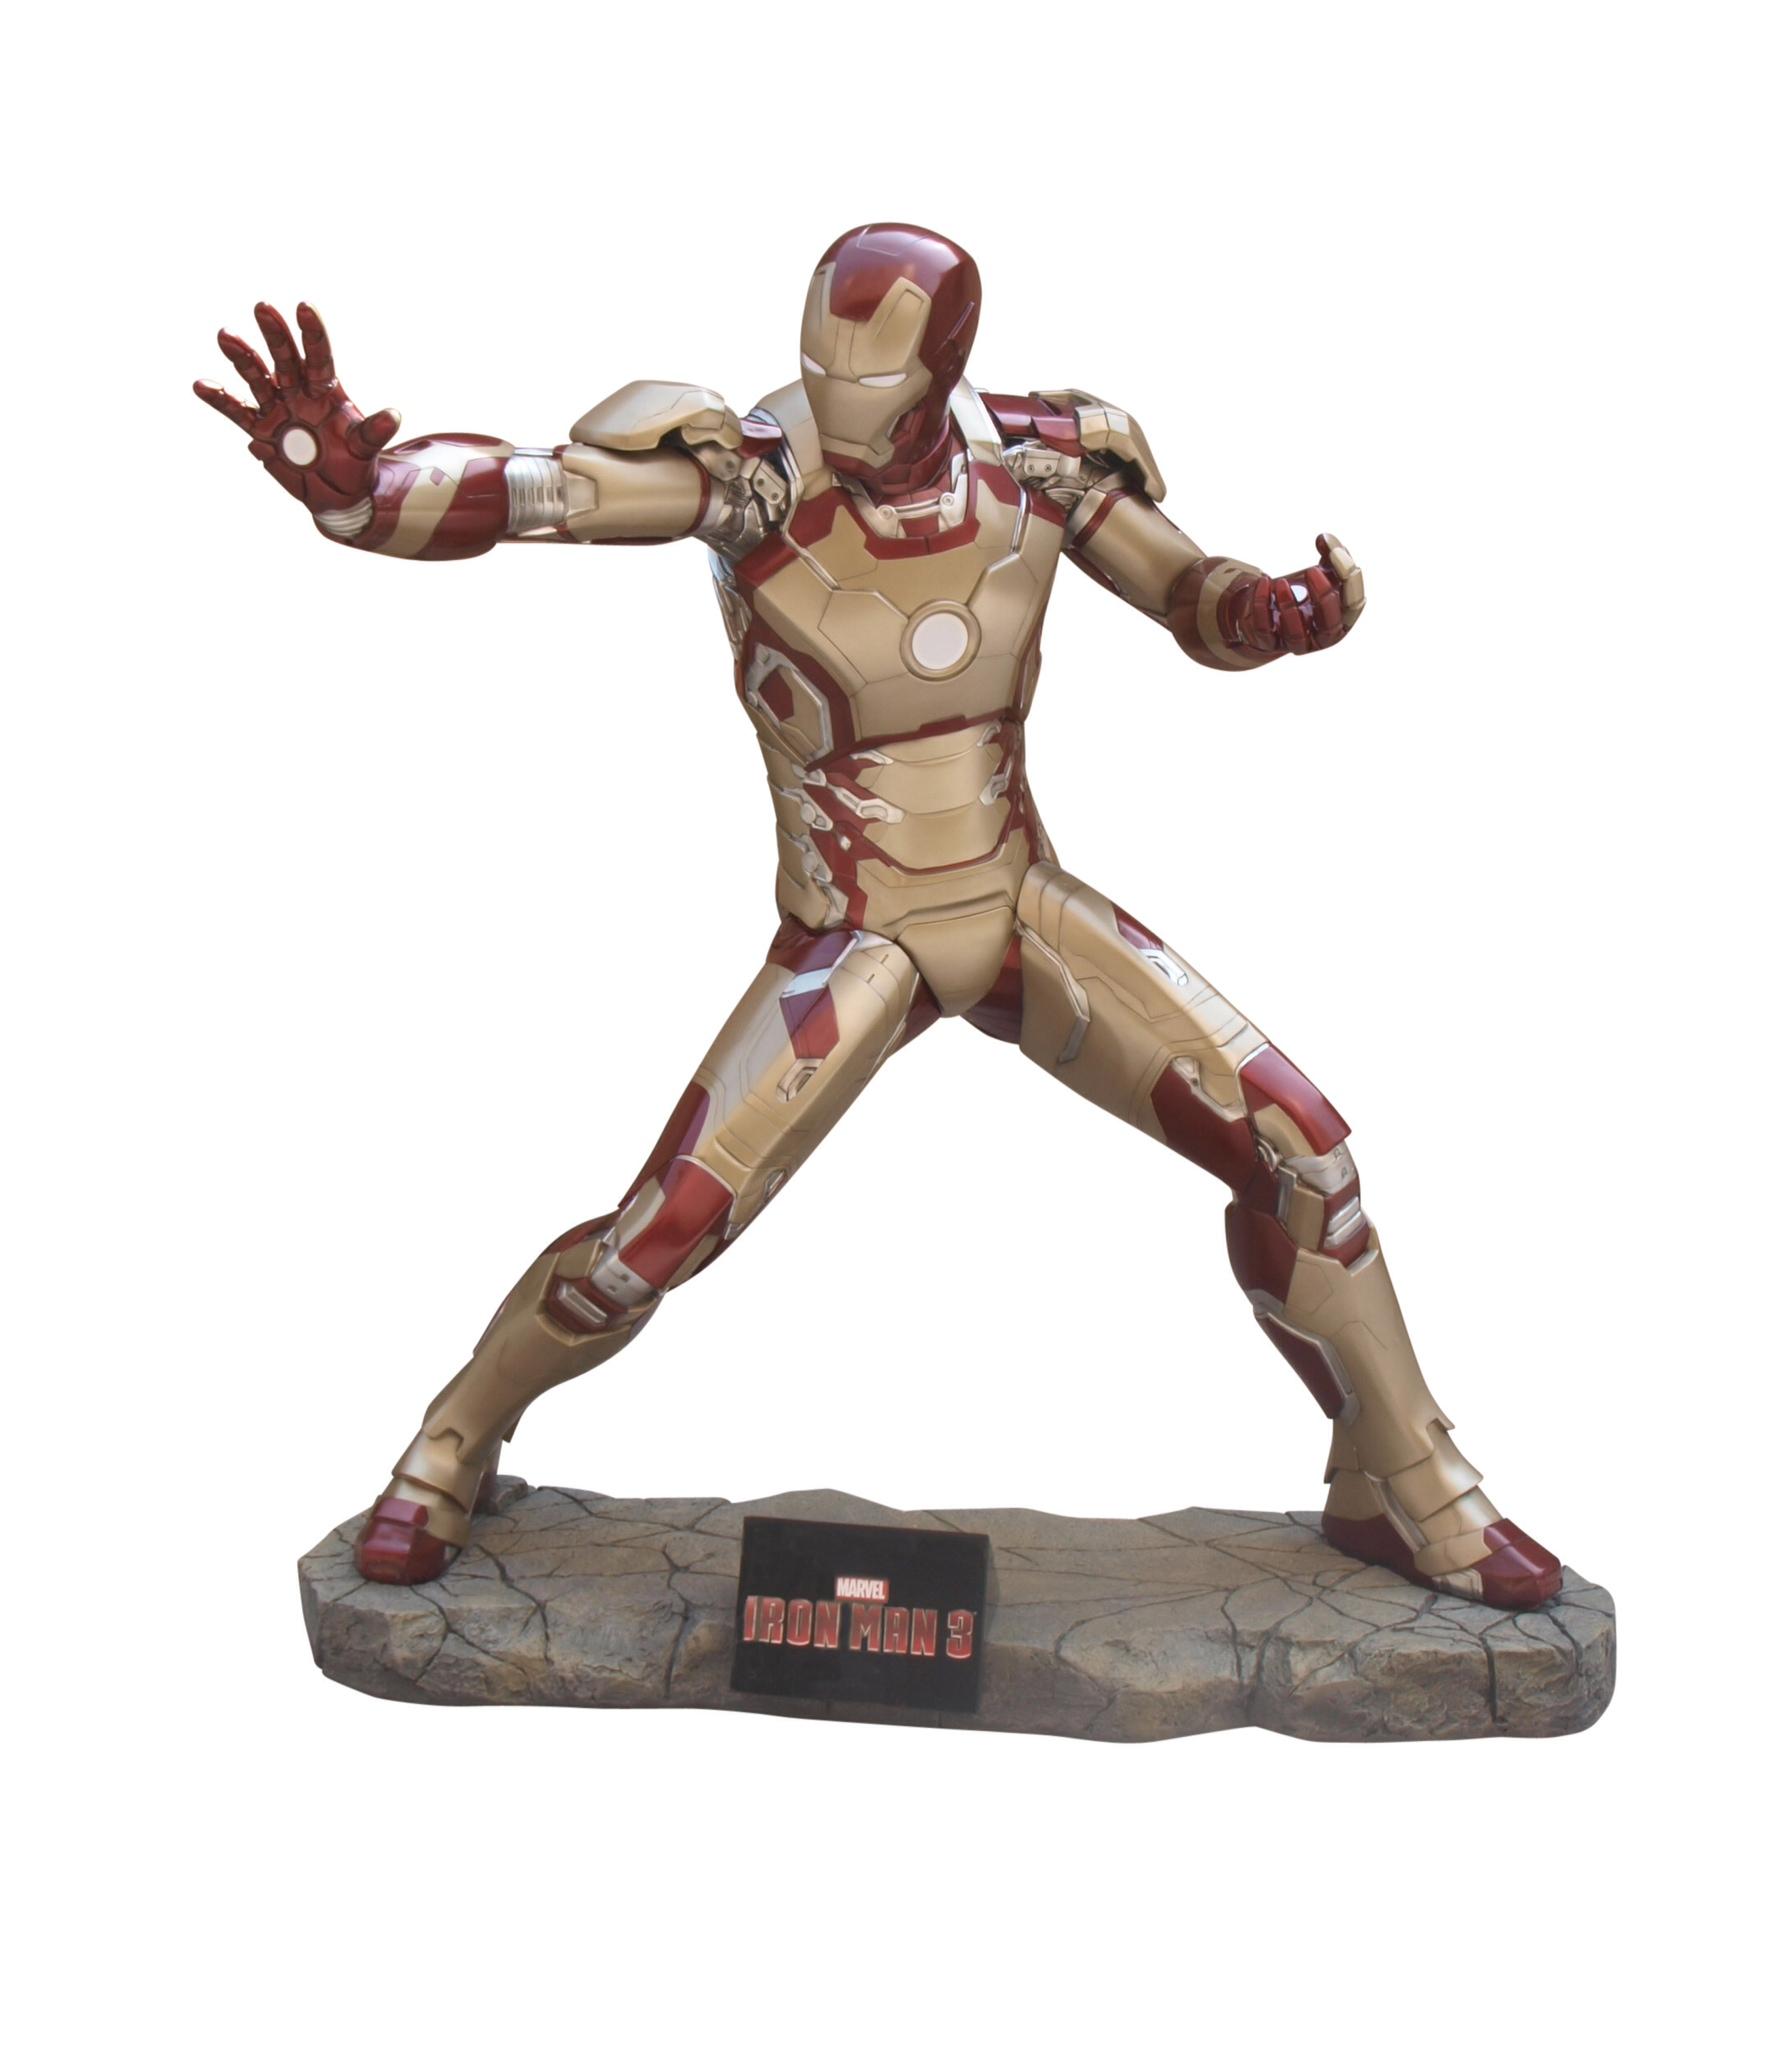 Iron Man 3 figurine